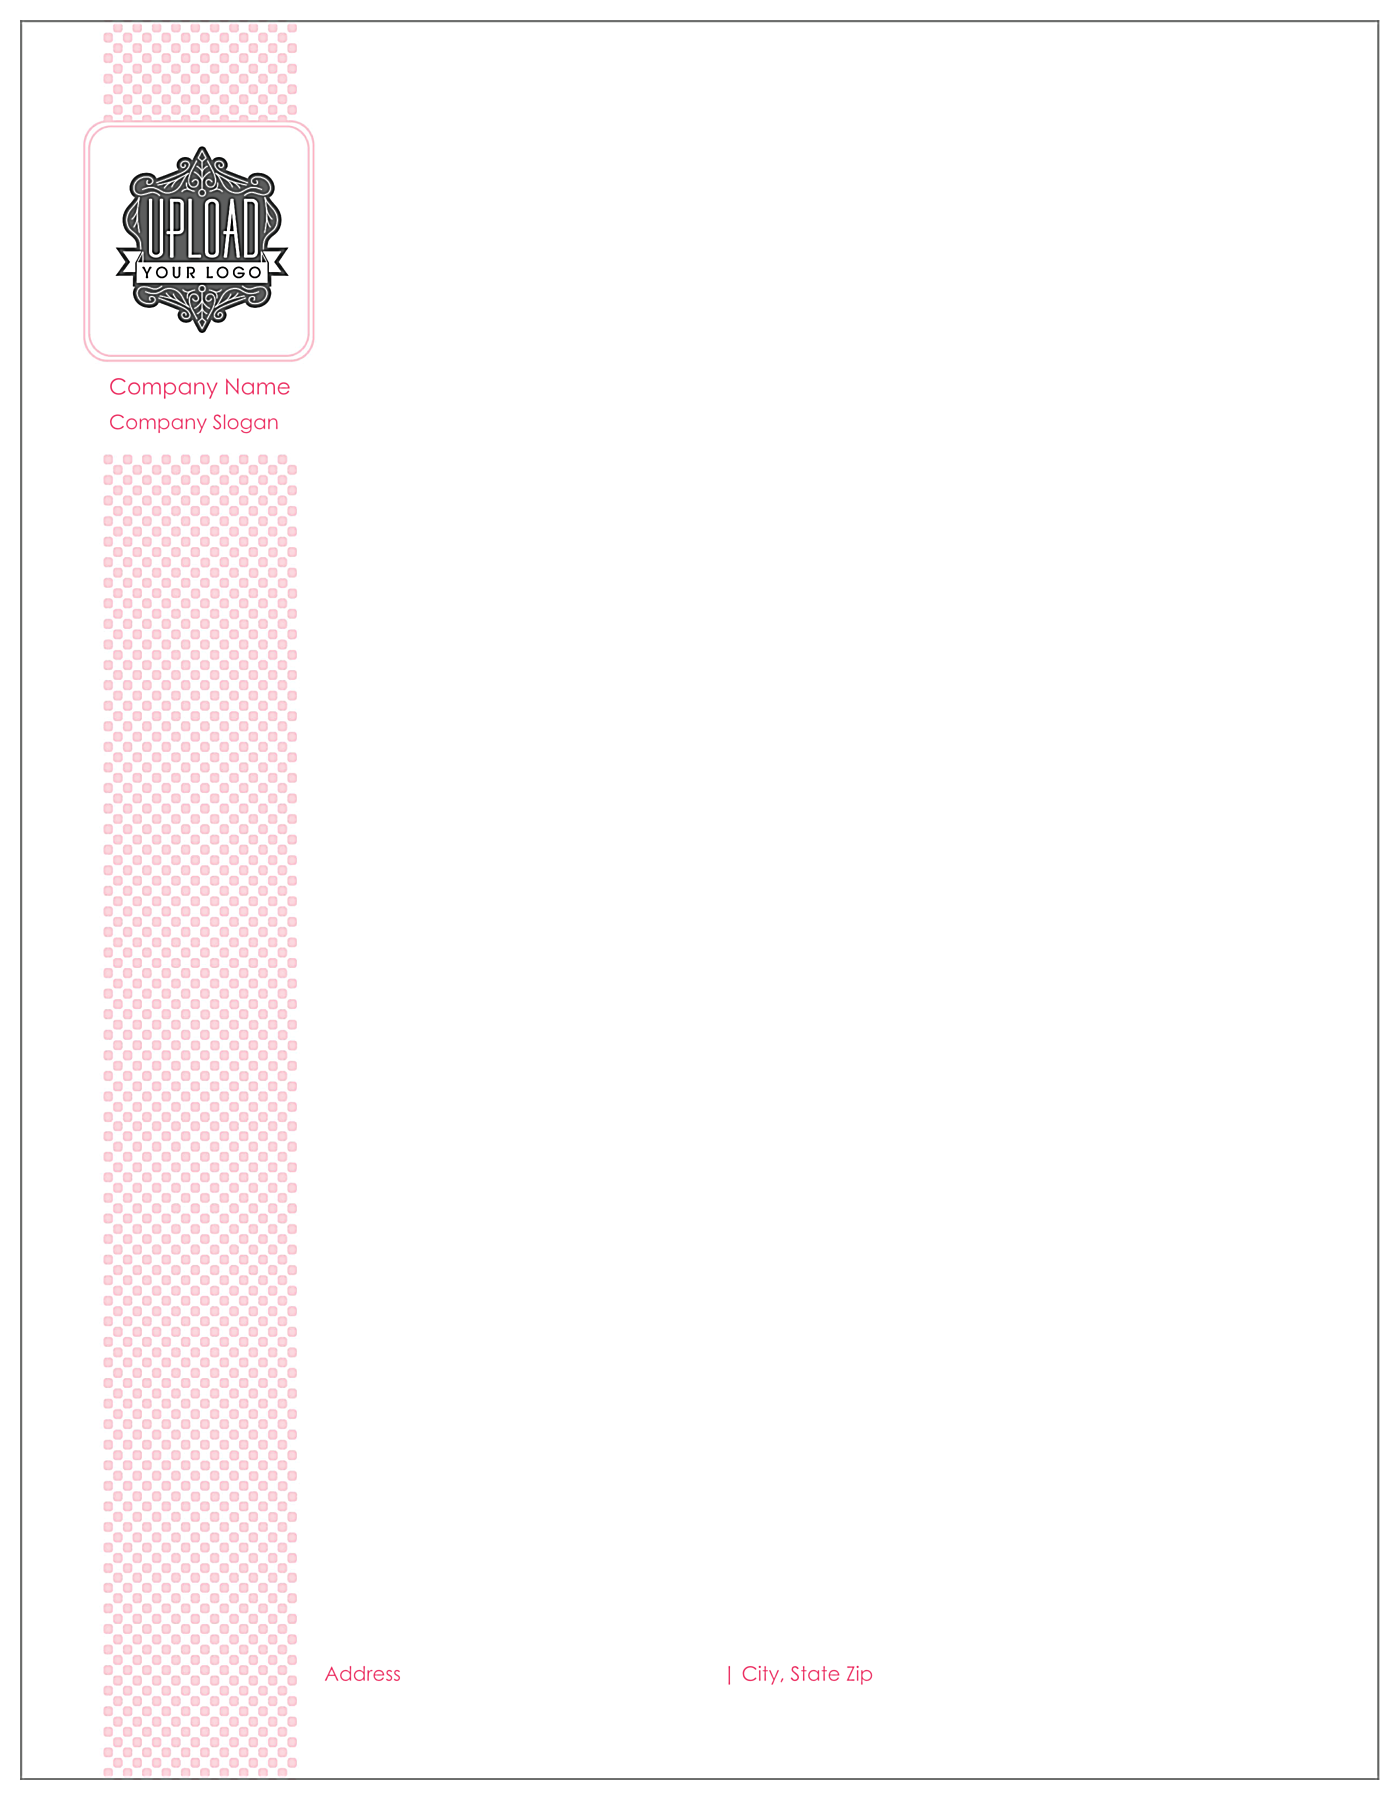 Halftone Dots front - Letterhead Maker